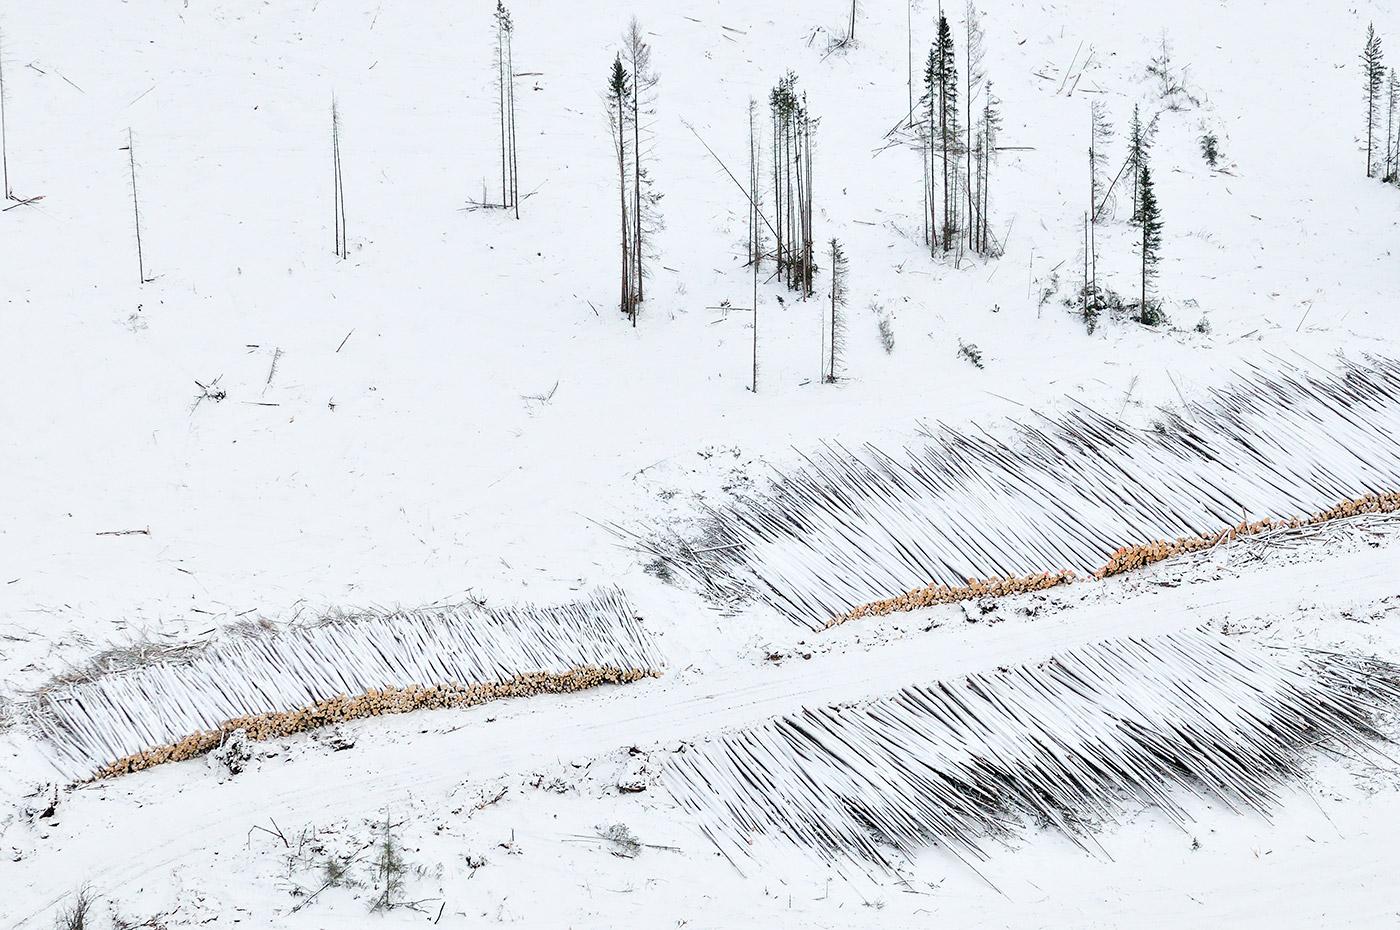 Winter-Logging-F0030533-Louis-Helbig-Alberta-Oil-Tar-Sands.jpg.1